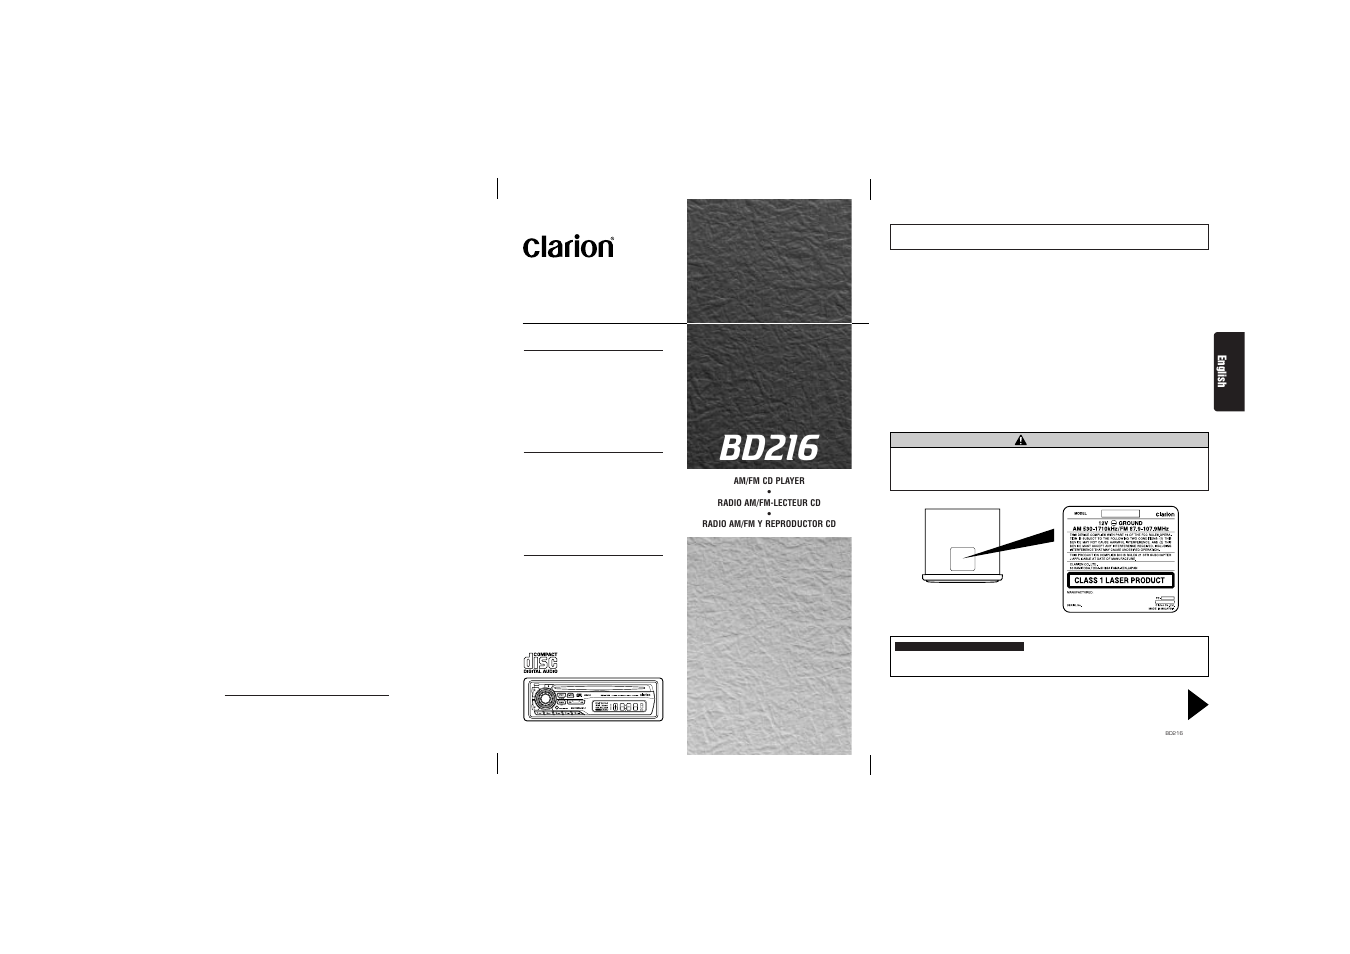 Clarion Bd216 Wiring Diagram And Schematics Free